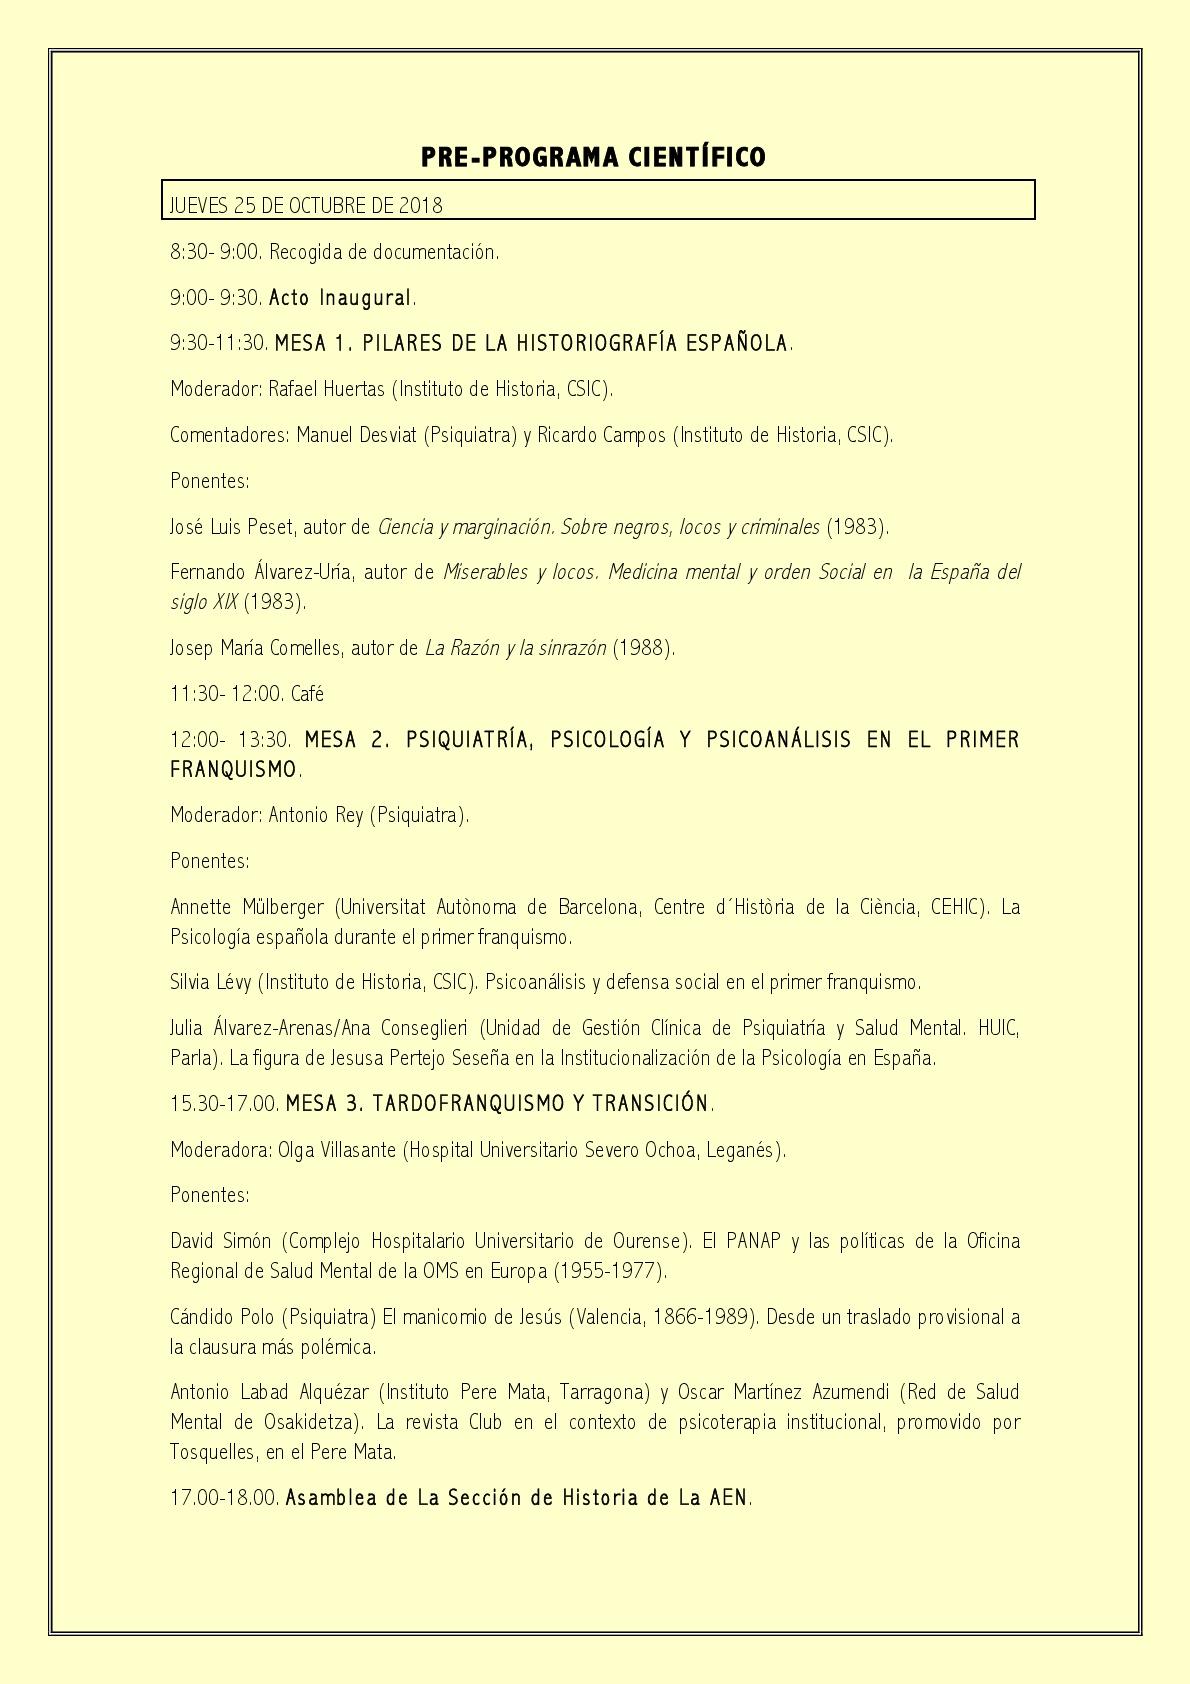 XI_JORNADAS_HISTORIA_AEN_2018–003